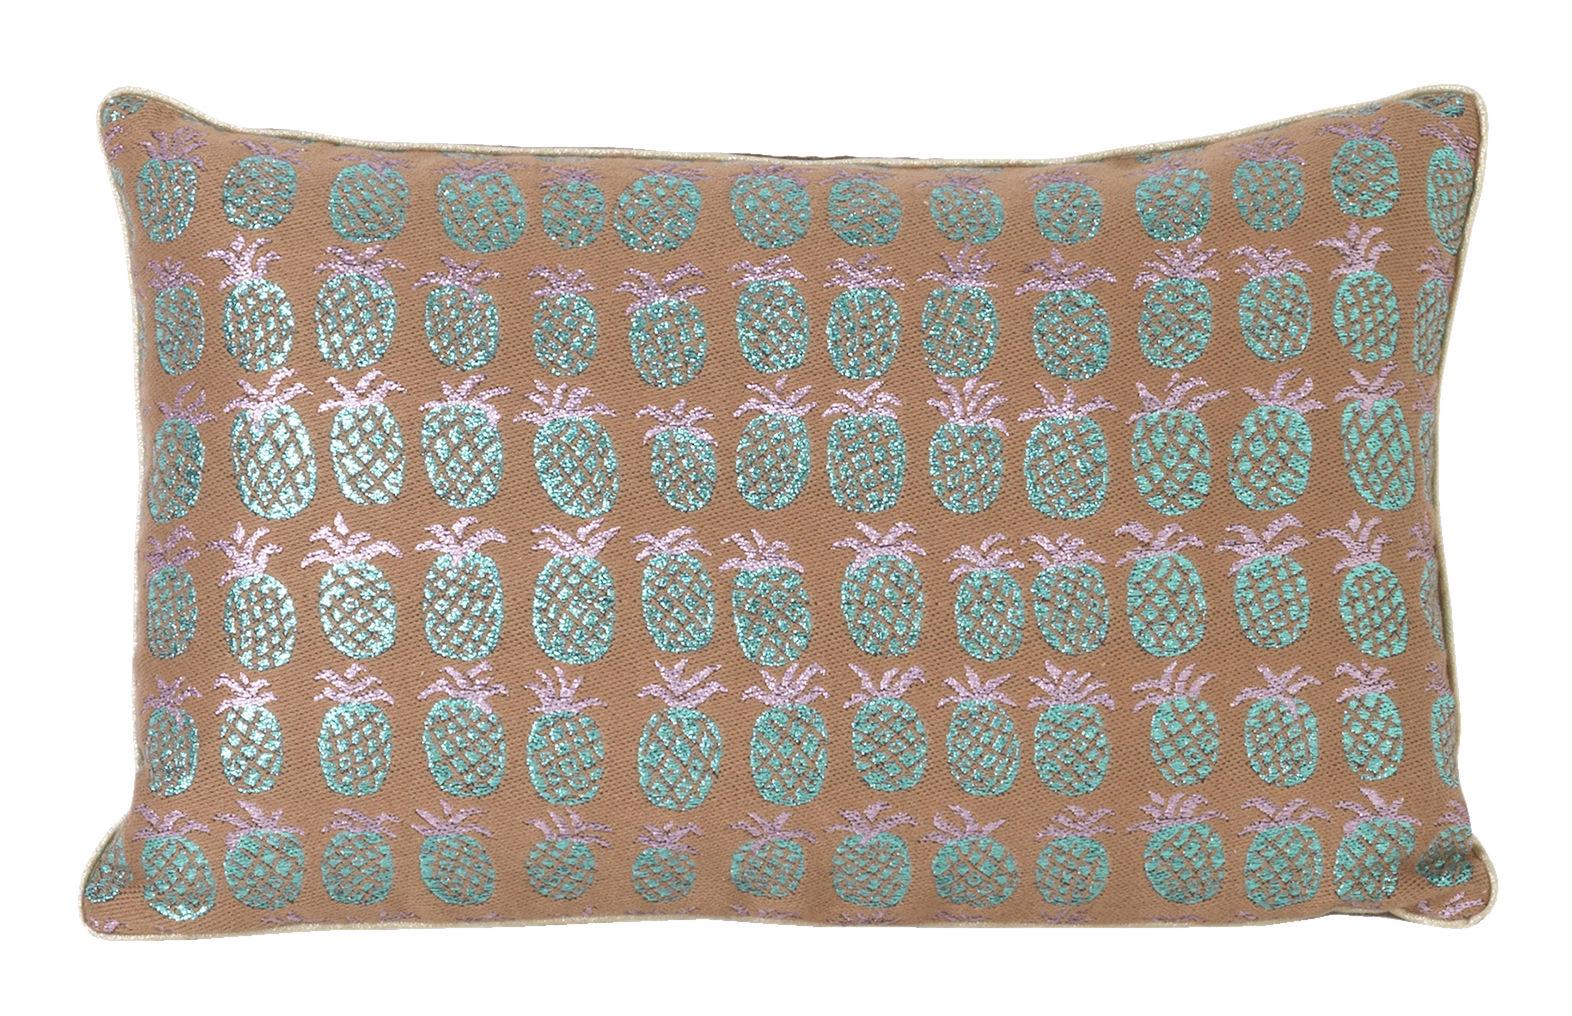 Interni - Cuscini  - Cuscino Salon - Ananas - / 40 x 25 cm di Ferm Living - Pesca & verde iridescente -  Plumes, Mélange de fibres, Velluto